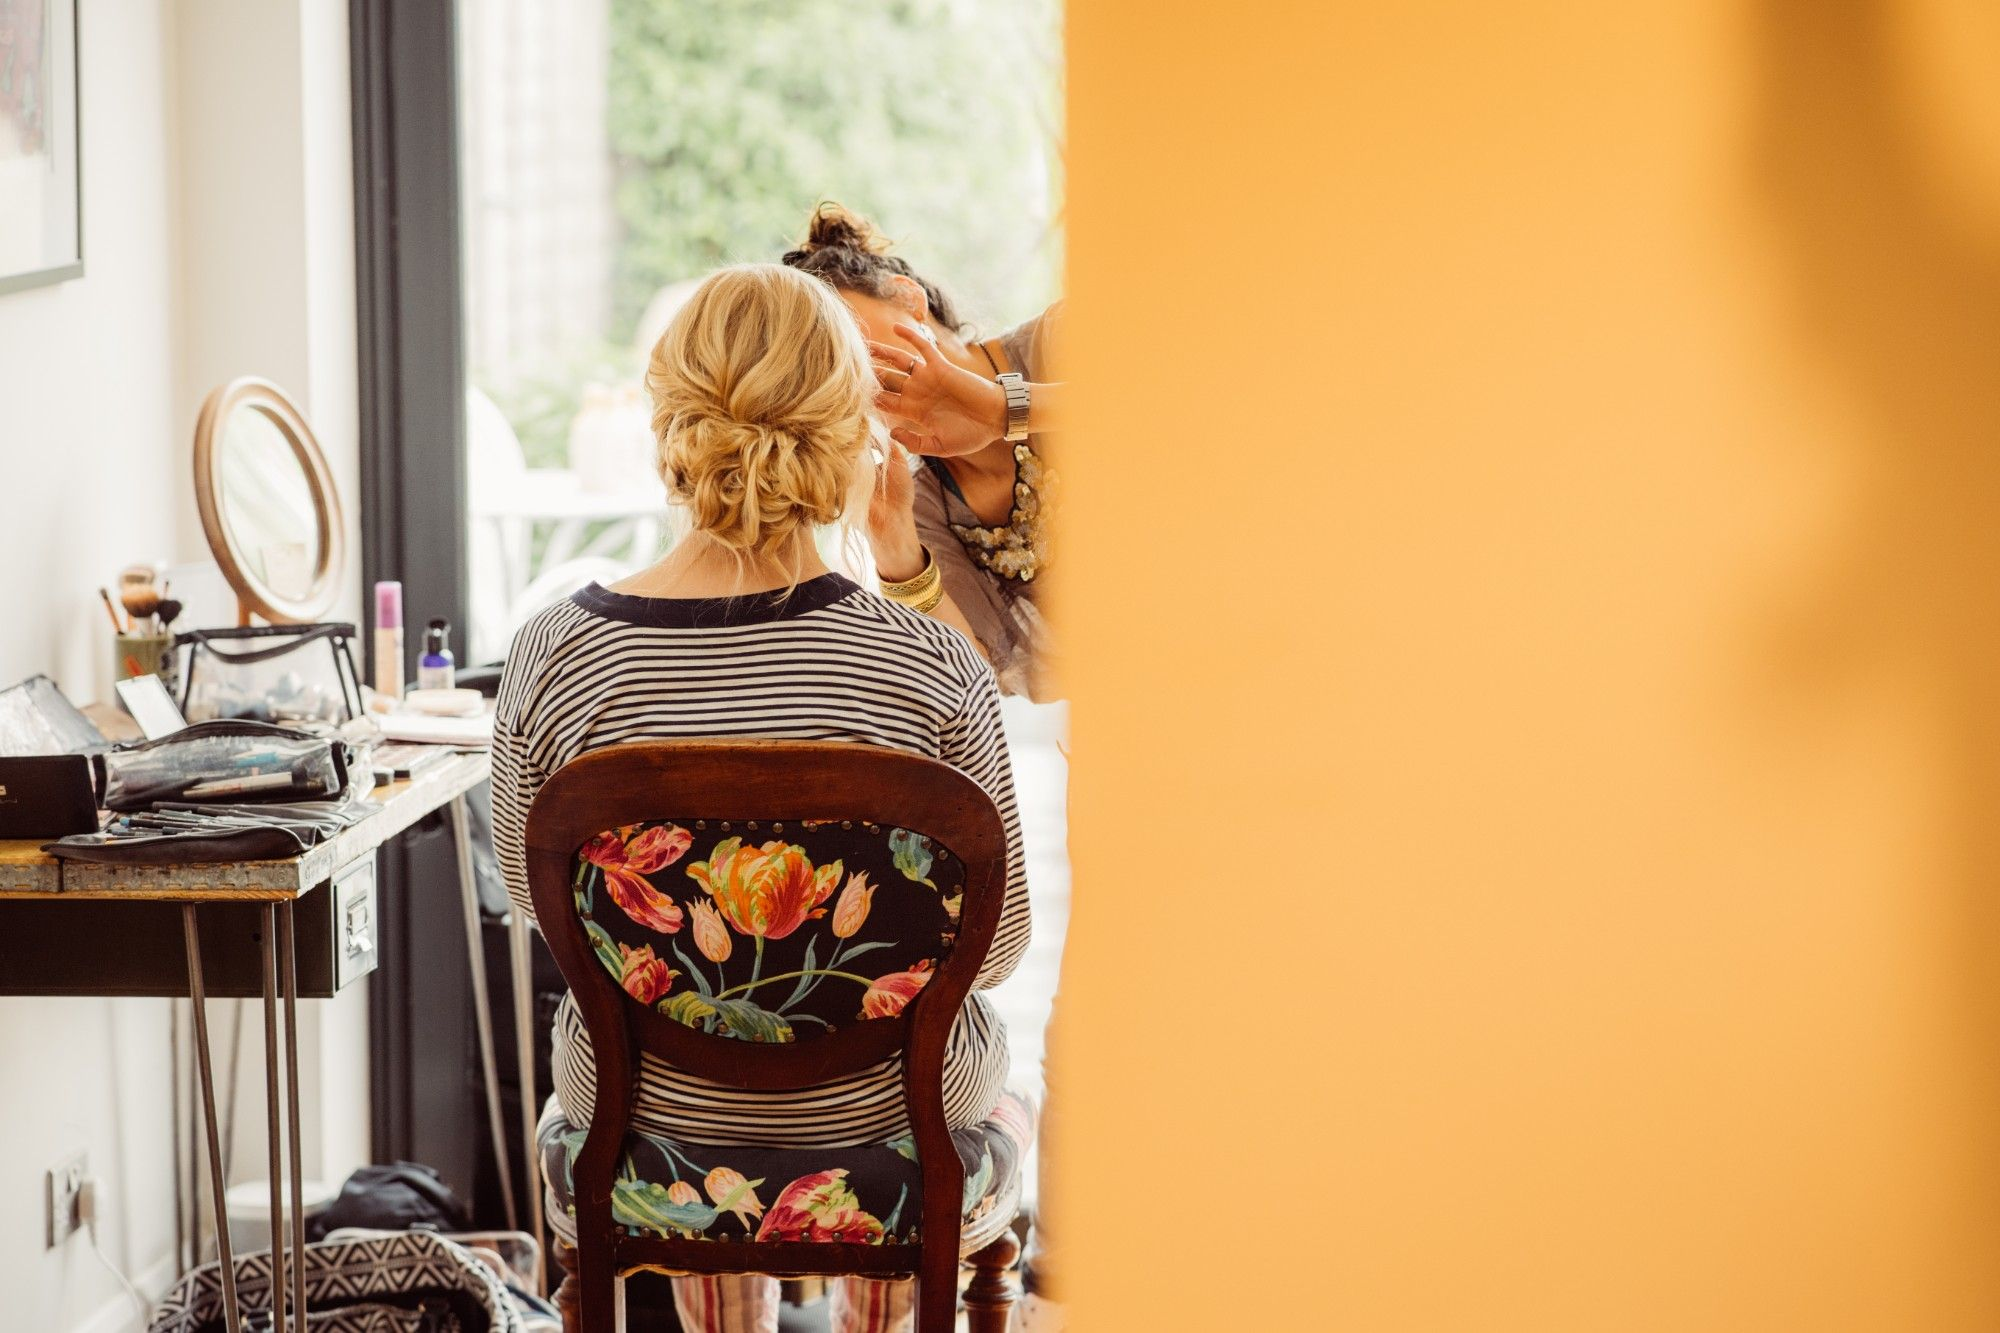 Bridal-wedding-hair-stylist-Tetbury-Gloucestershire-UK-LL-9.jpg